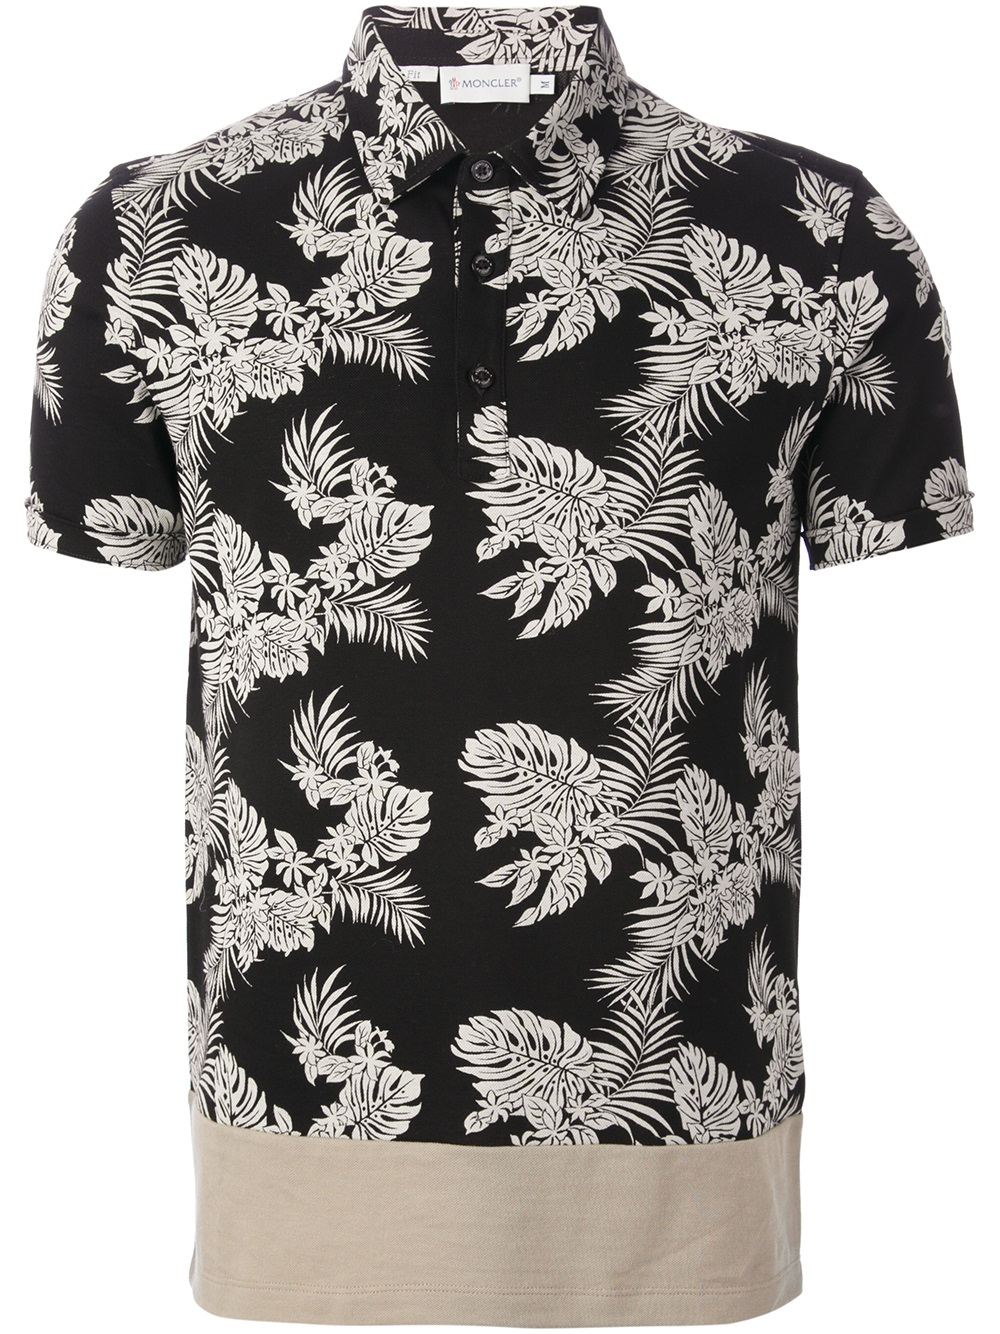 Lyst Moncler Floral Polo Shirt In Black For Men